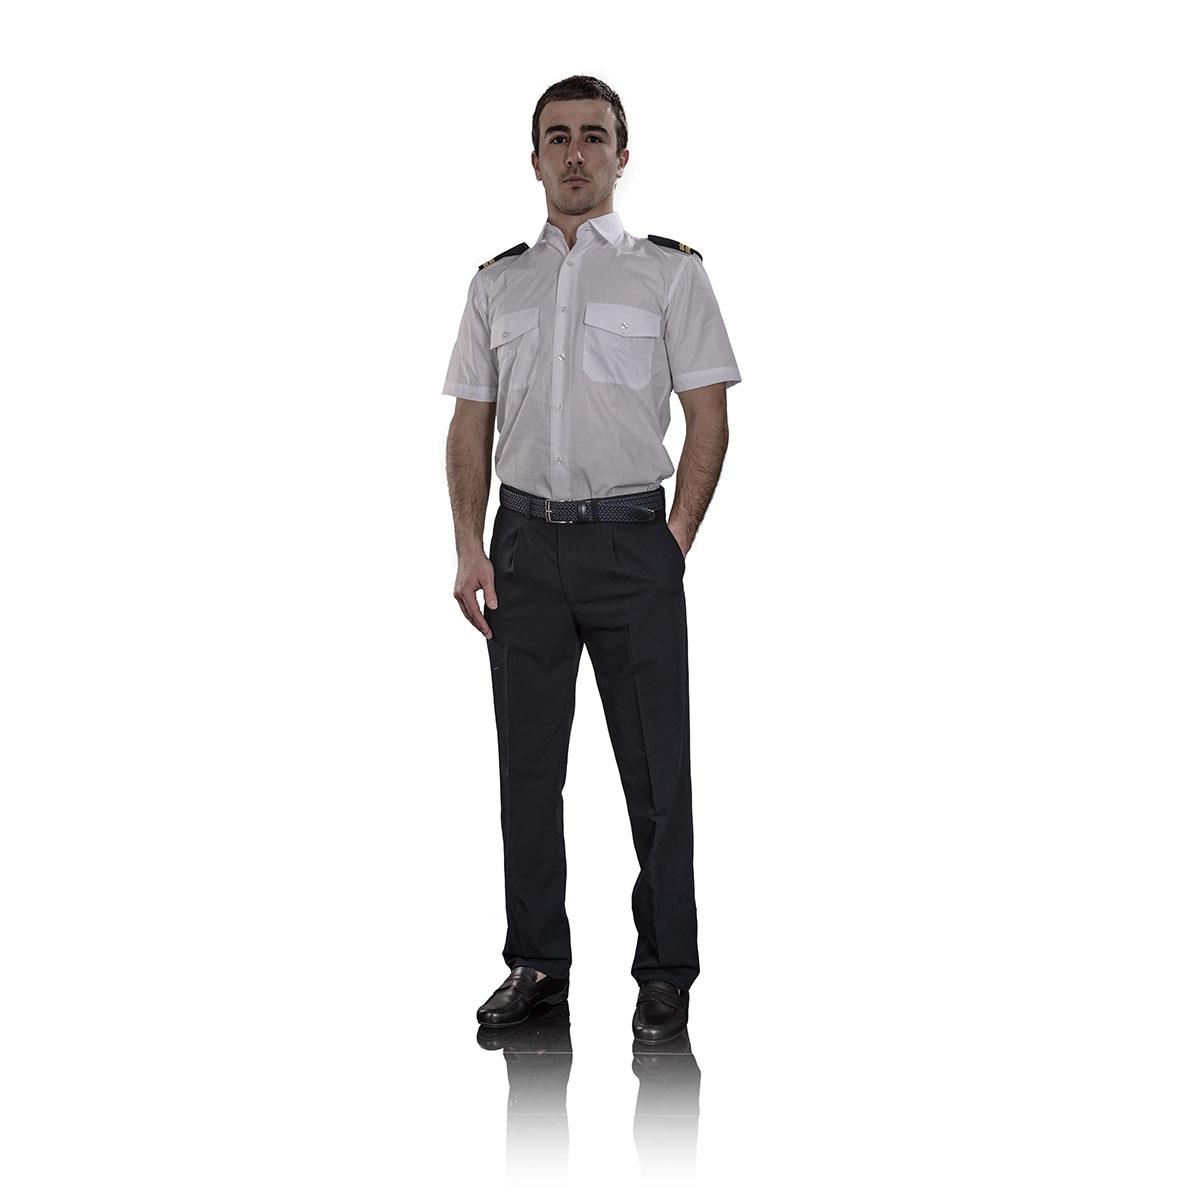 Yacht Uniform - Gallery